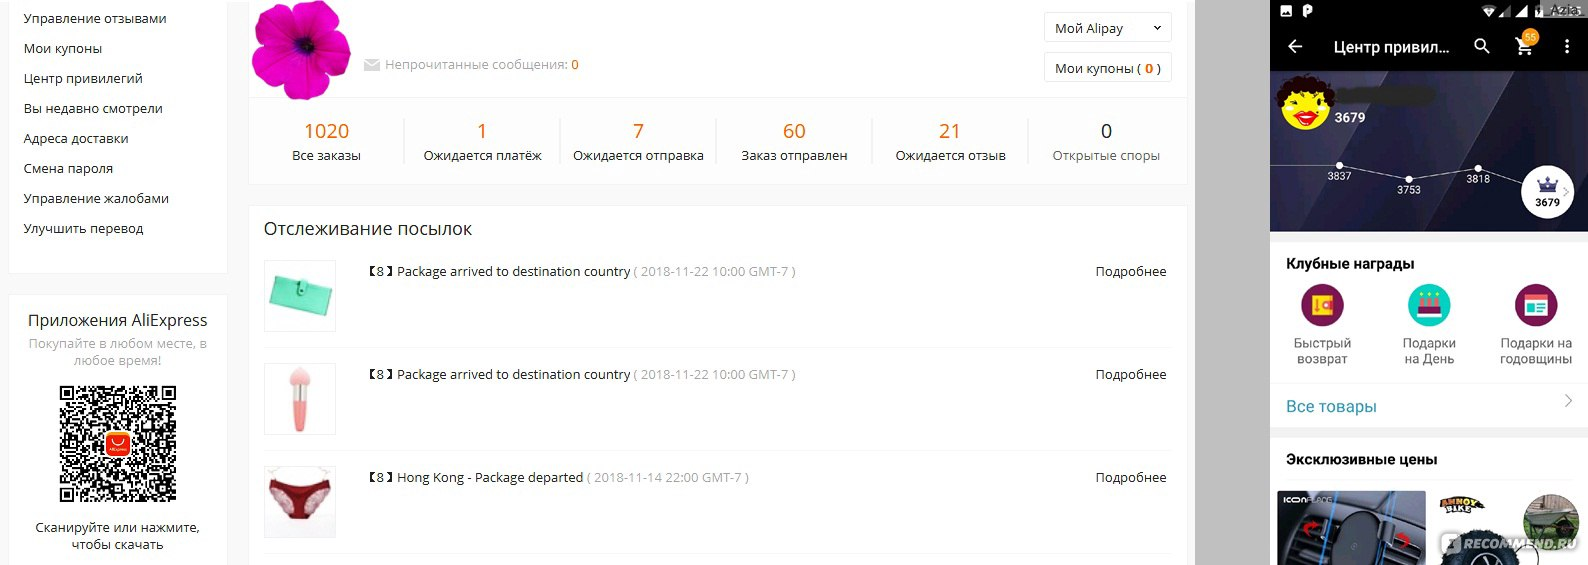 d51b2eb8f aliexpress.com - «Aliexpress» - интернет-гипермаркет - «Более 1000 ...